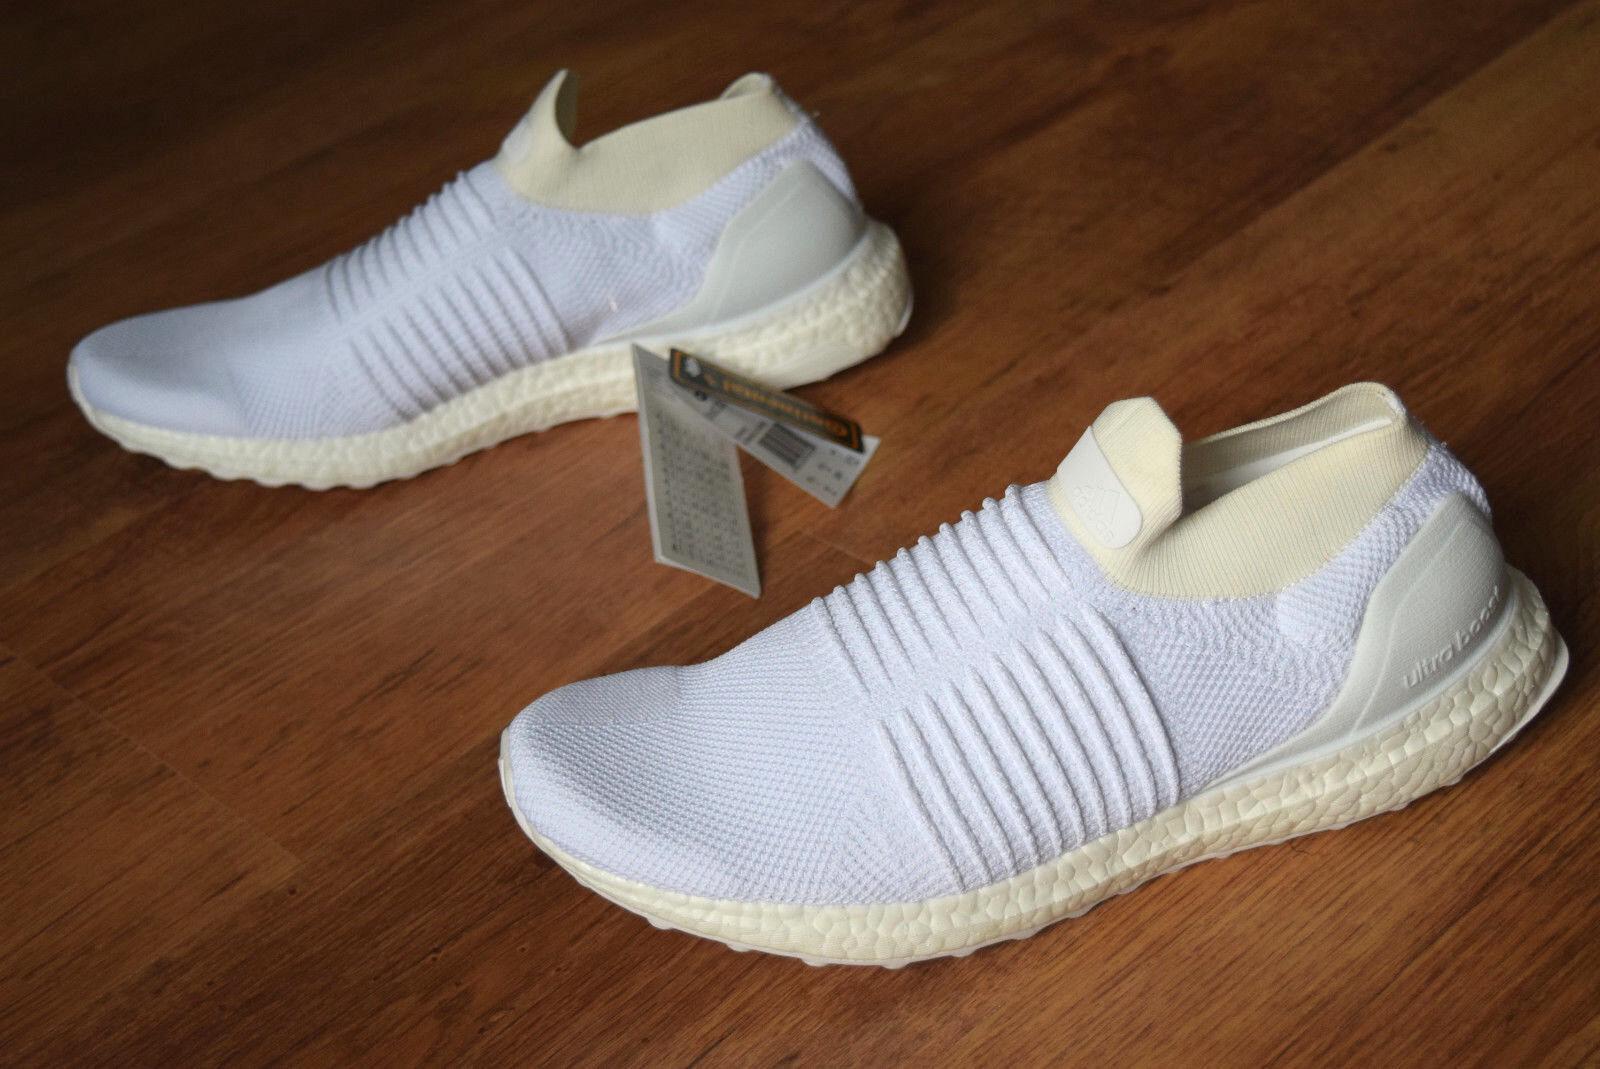 Adidas UltraBoost S80768 Laceless 44 44,5 47 S80768 UltraBoost ultra Bottes tripple blanc  nmd yeezy 187db8